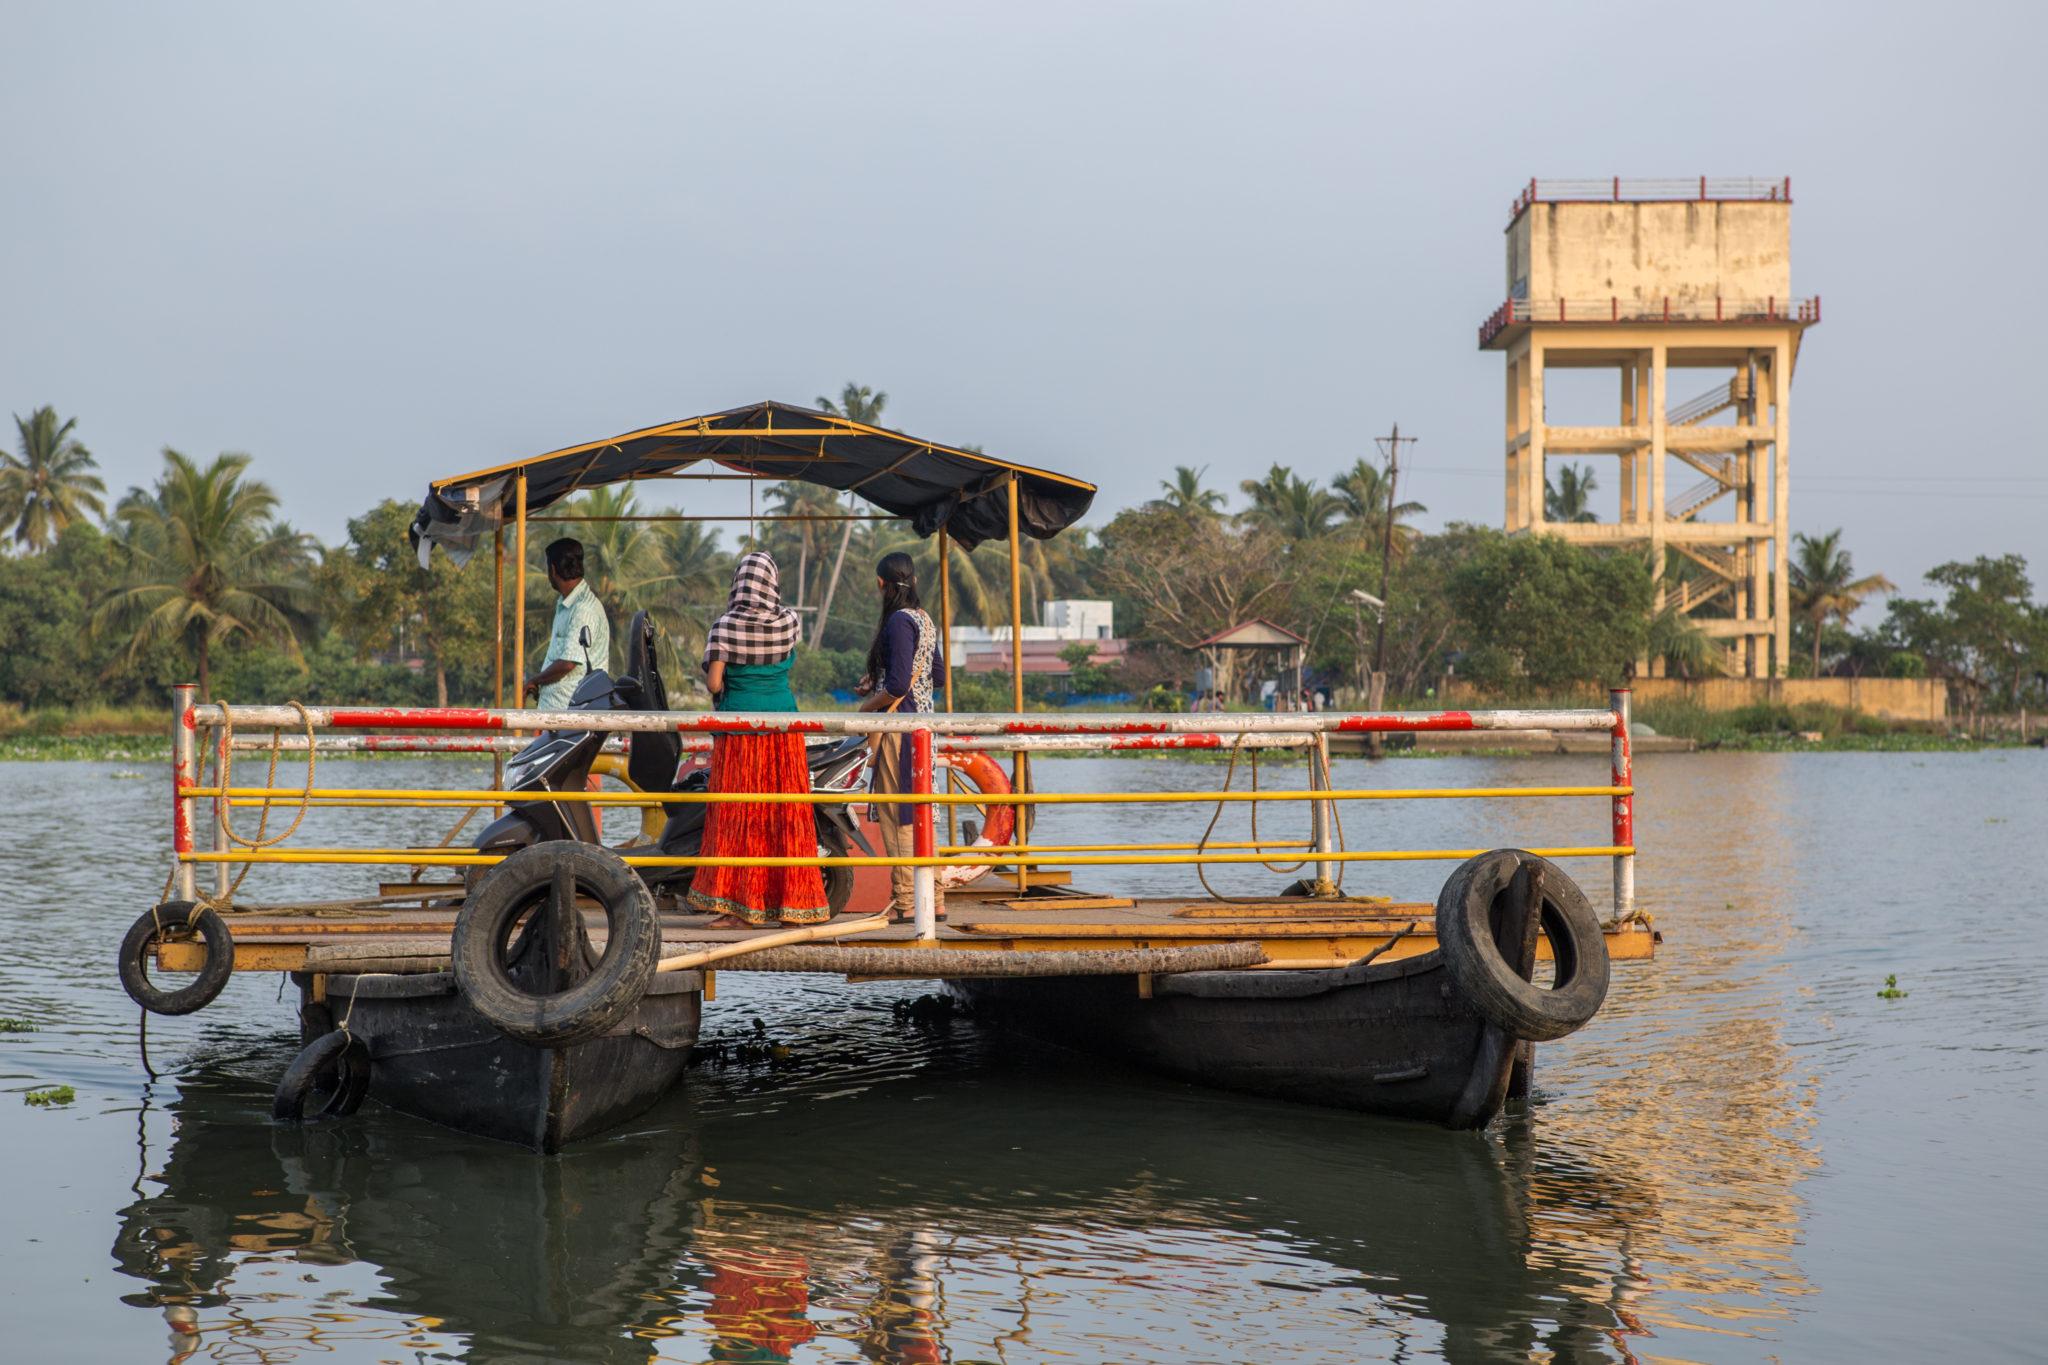 bateau-fort cochin-kerala-inde-voyage